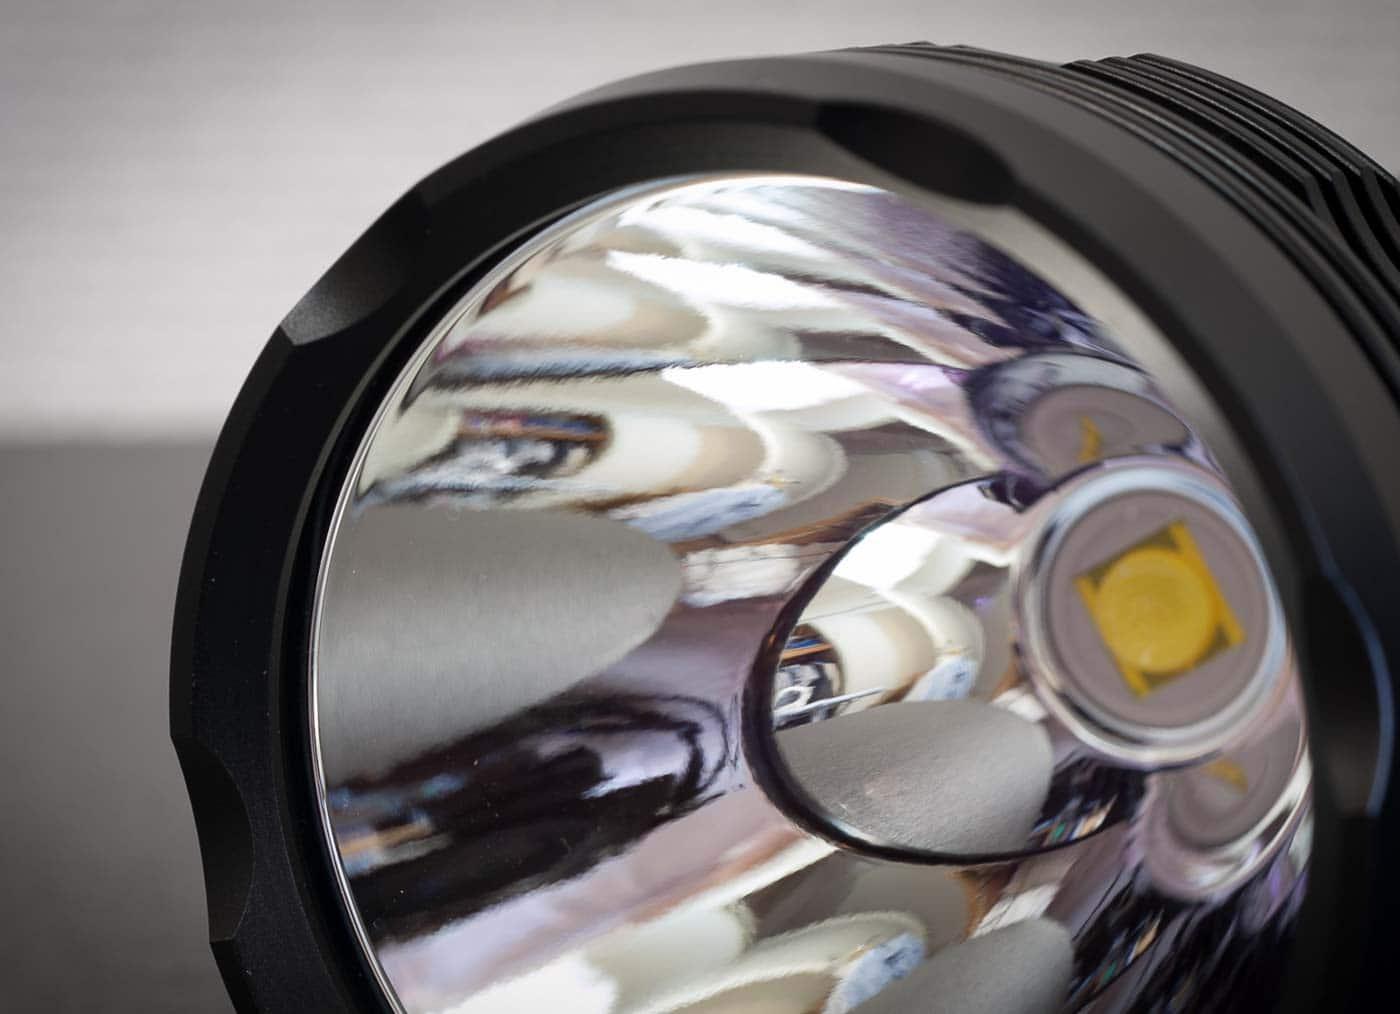 k40m reflector 2